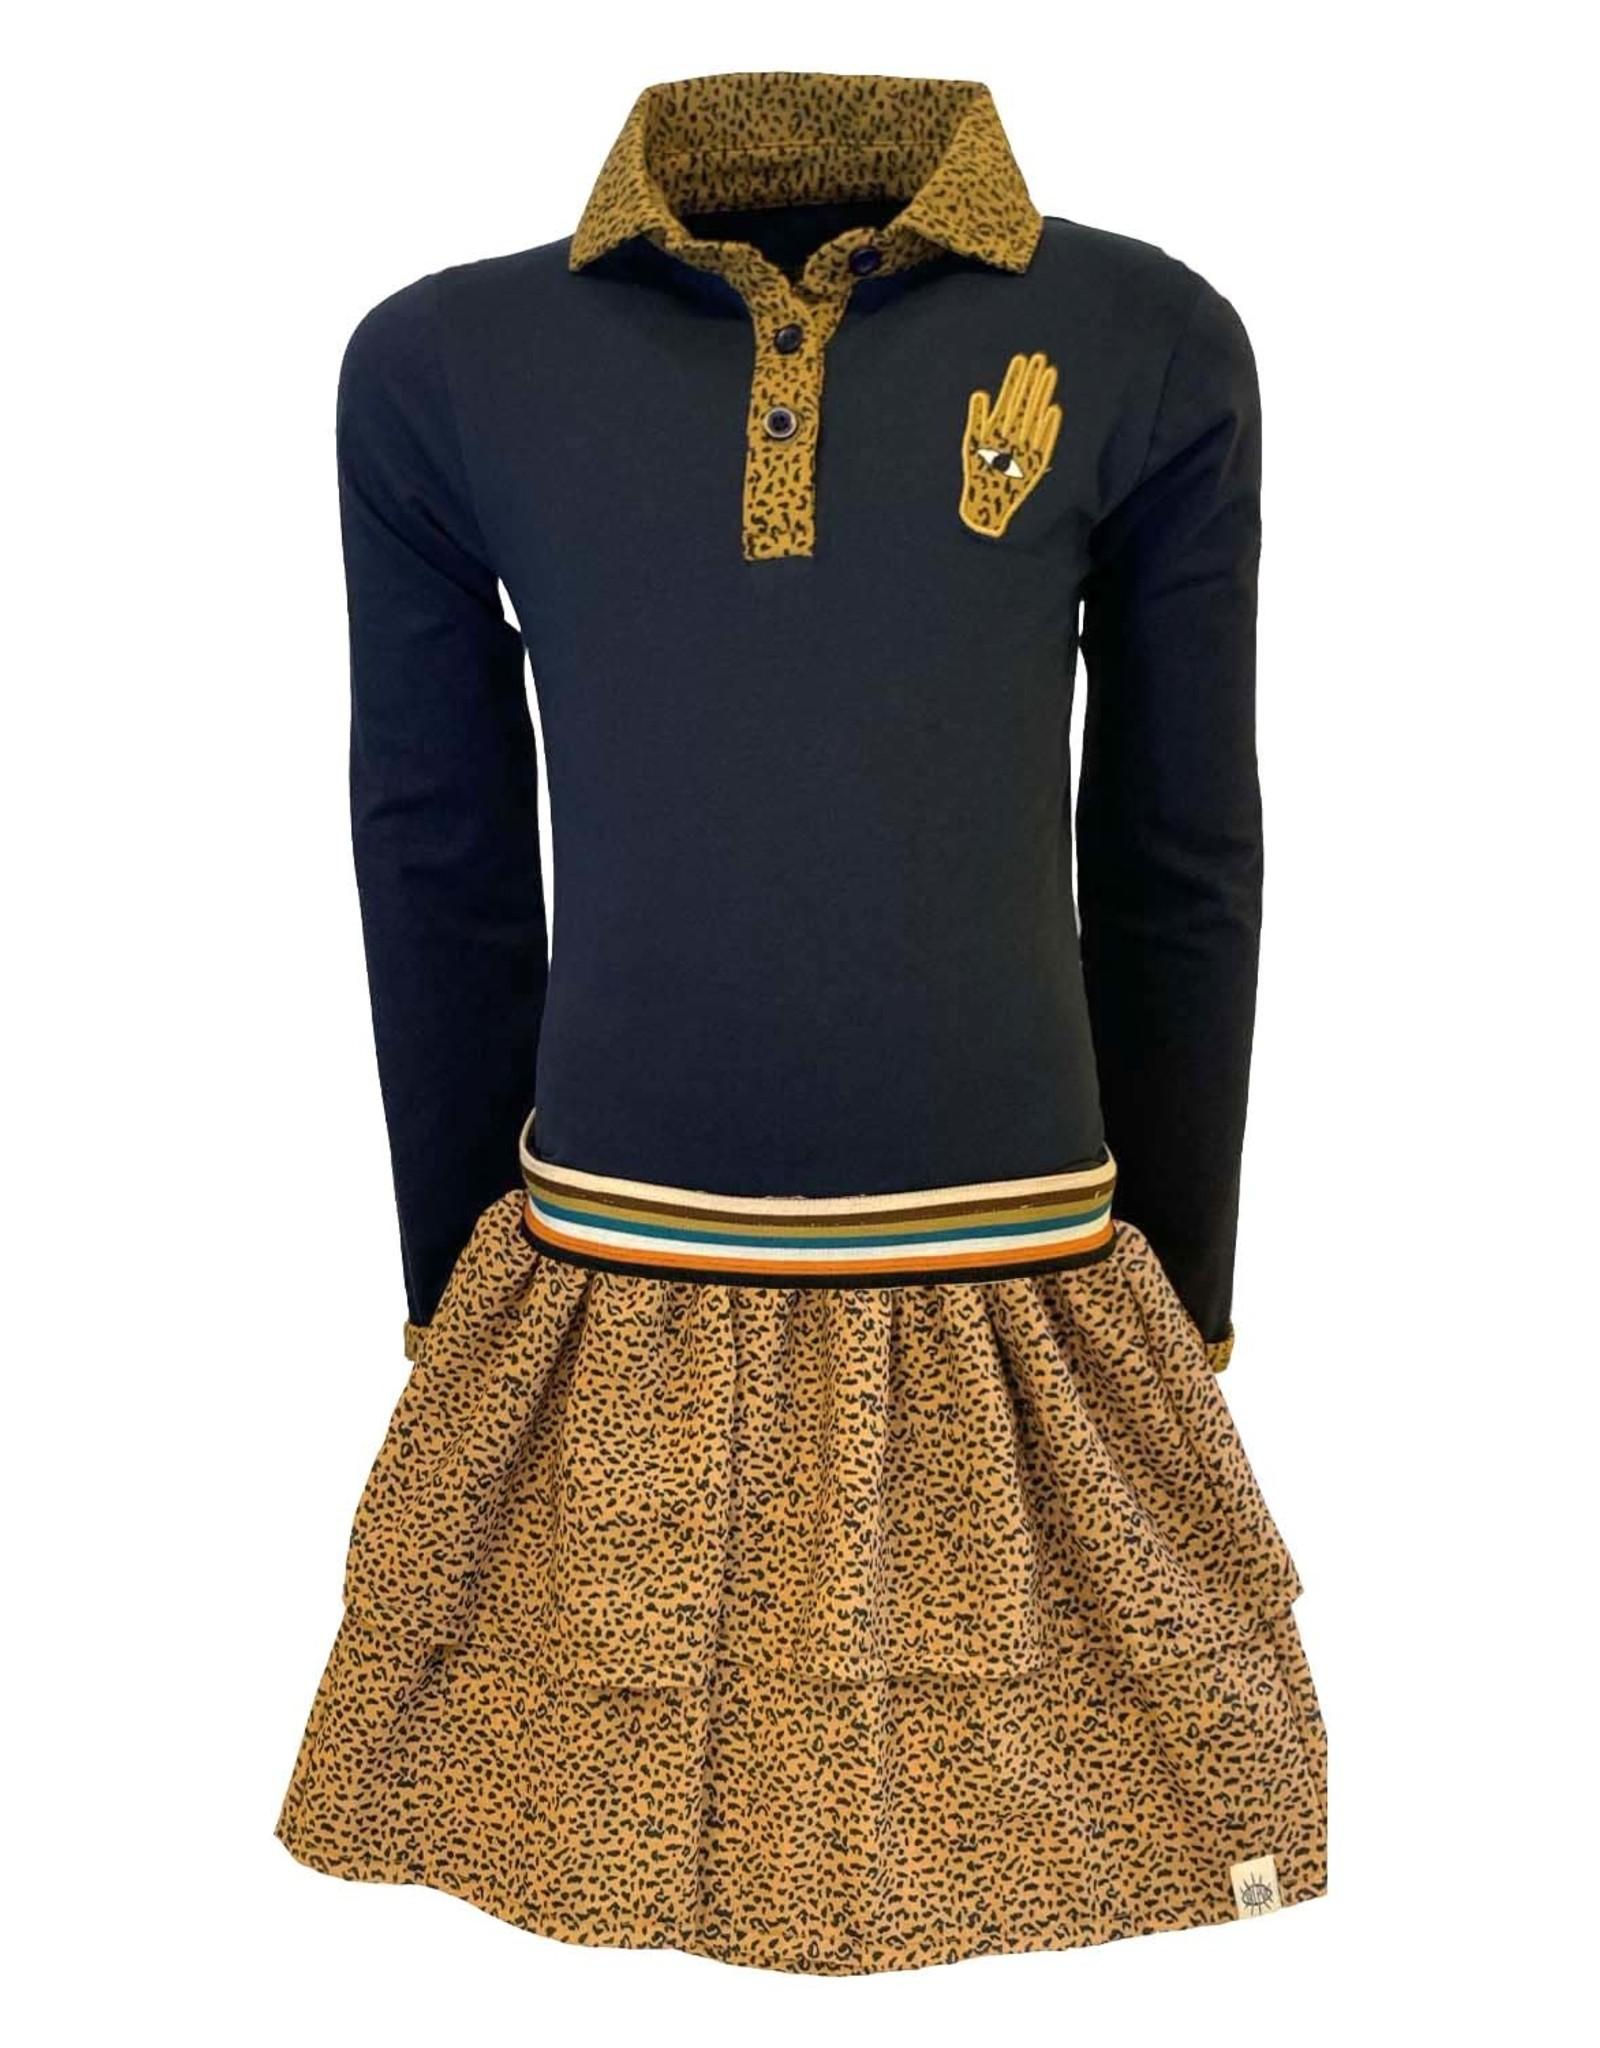 Topitm Topitm meiden jurk Aukje Leopard Brown